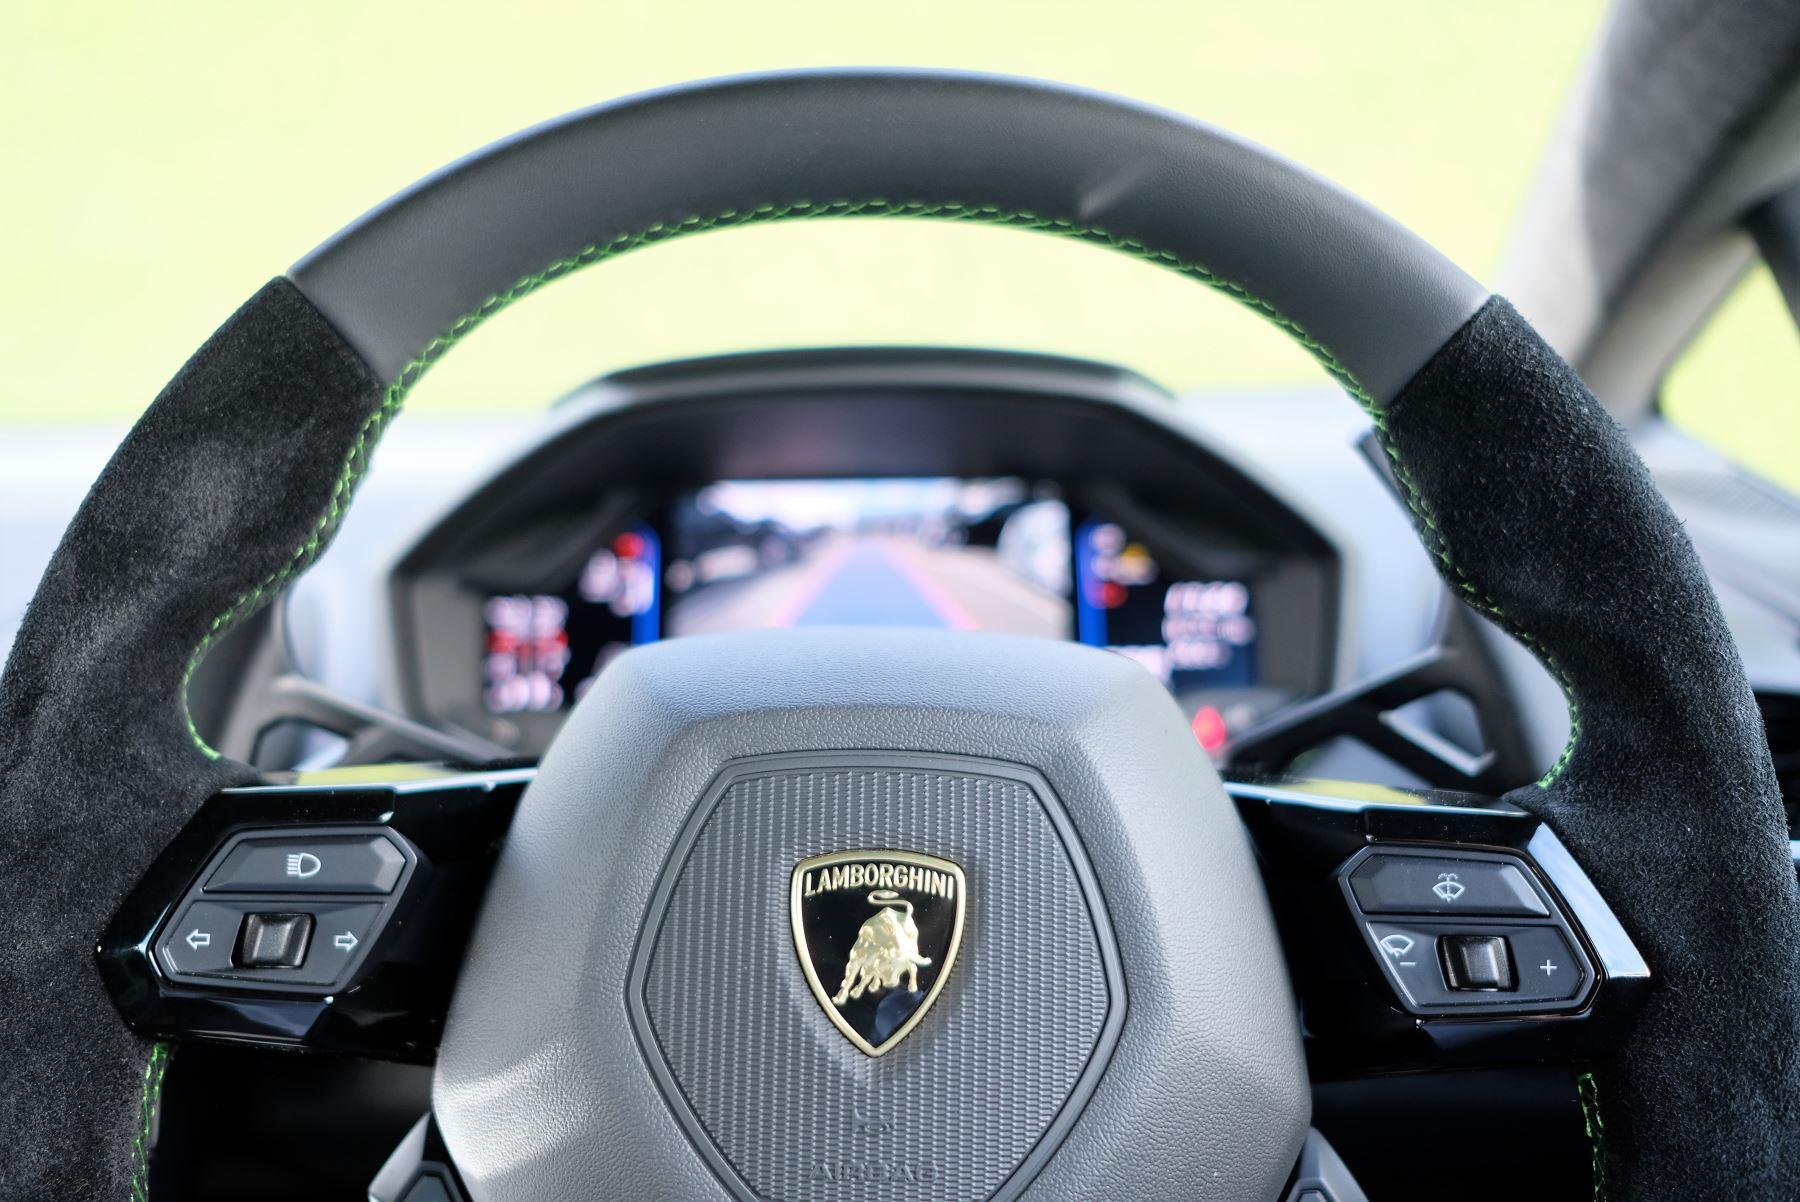 Lamborghini Huracan EVO 5.2 V10 640 2dr Auto AWD image 14